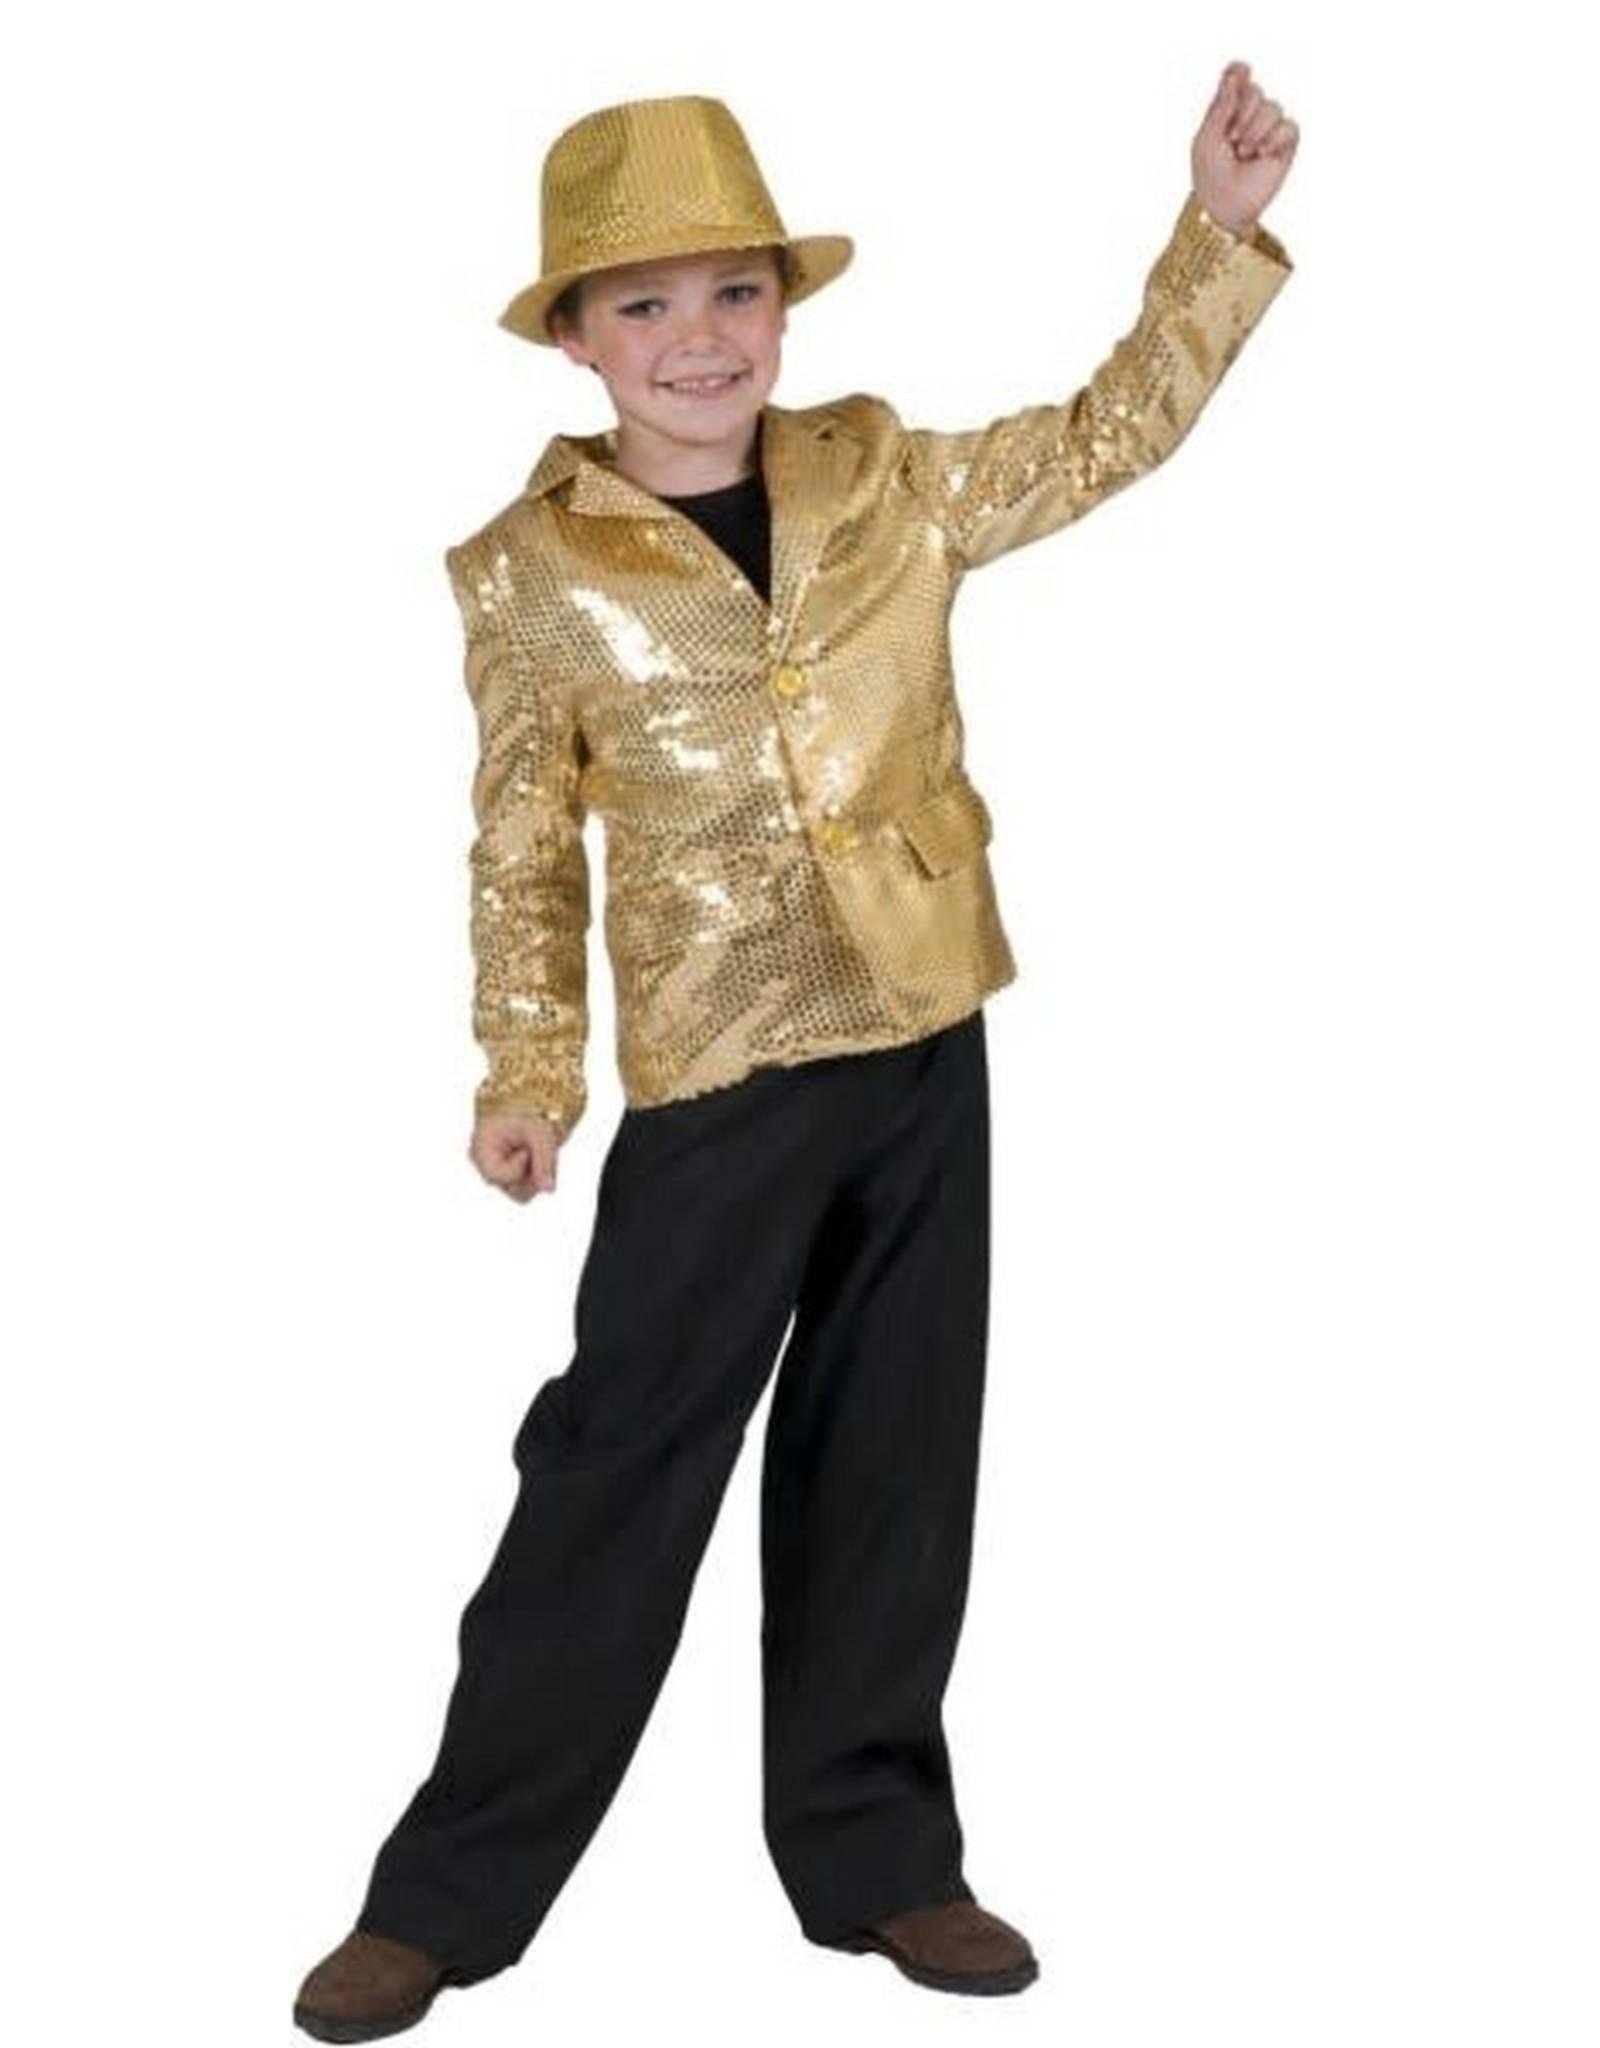 ESPA glittervest goud 116 huurprijs 20